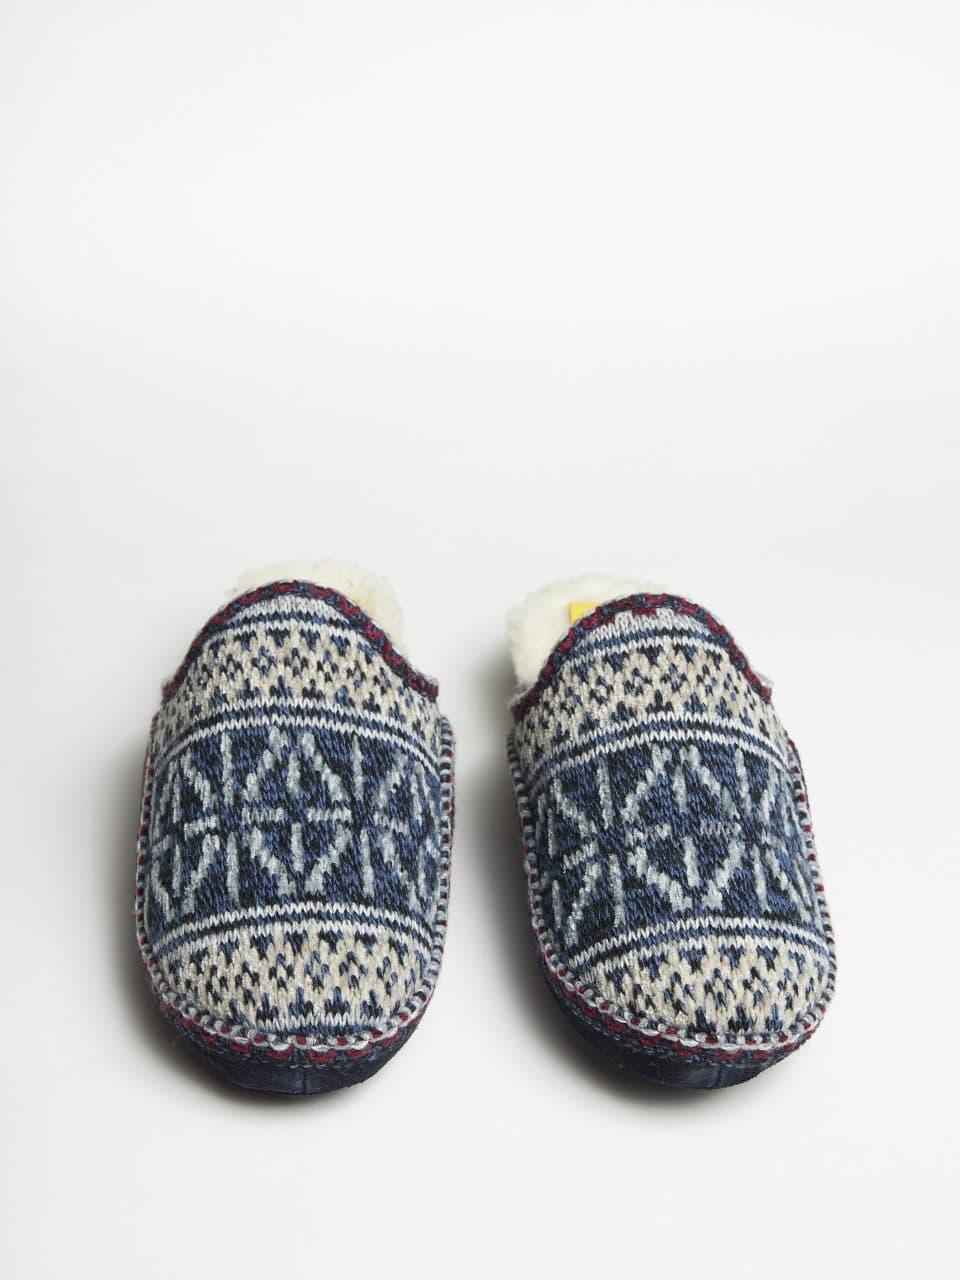 ZUECO TEIDE MARINO Marcas en Loyna Shoes